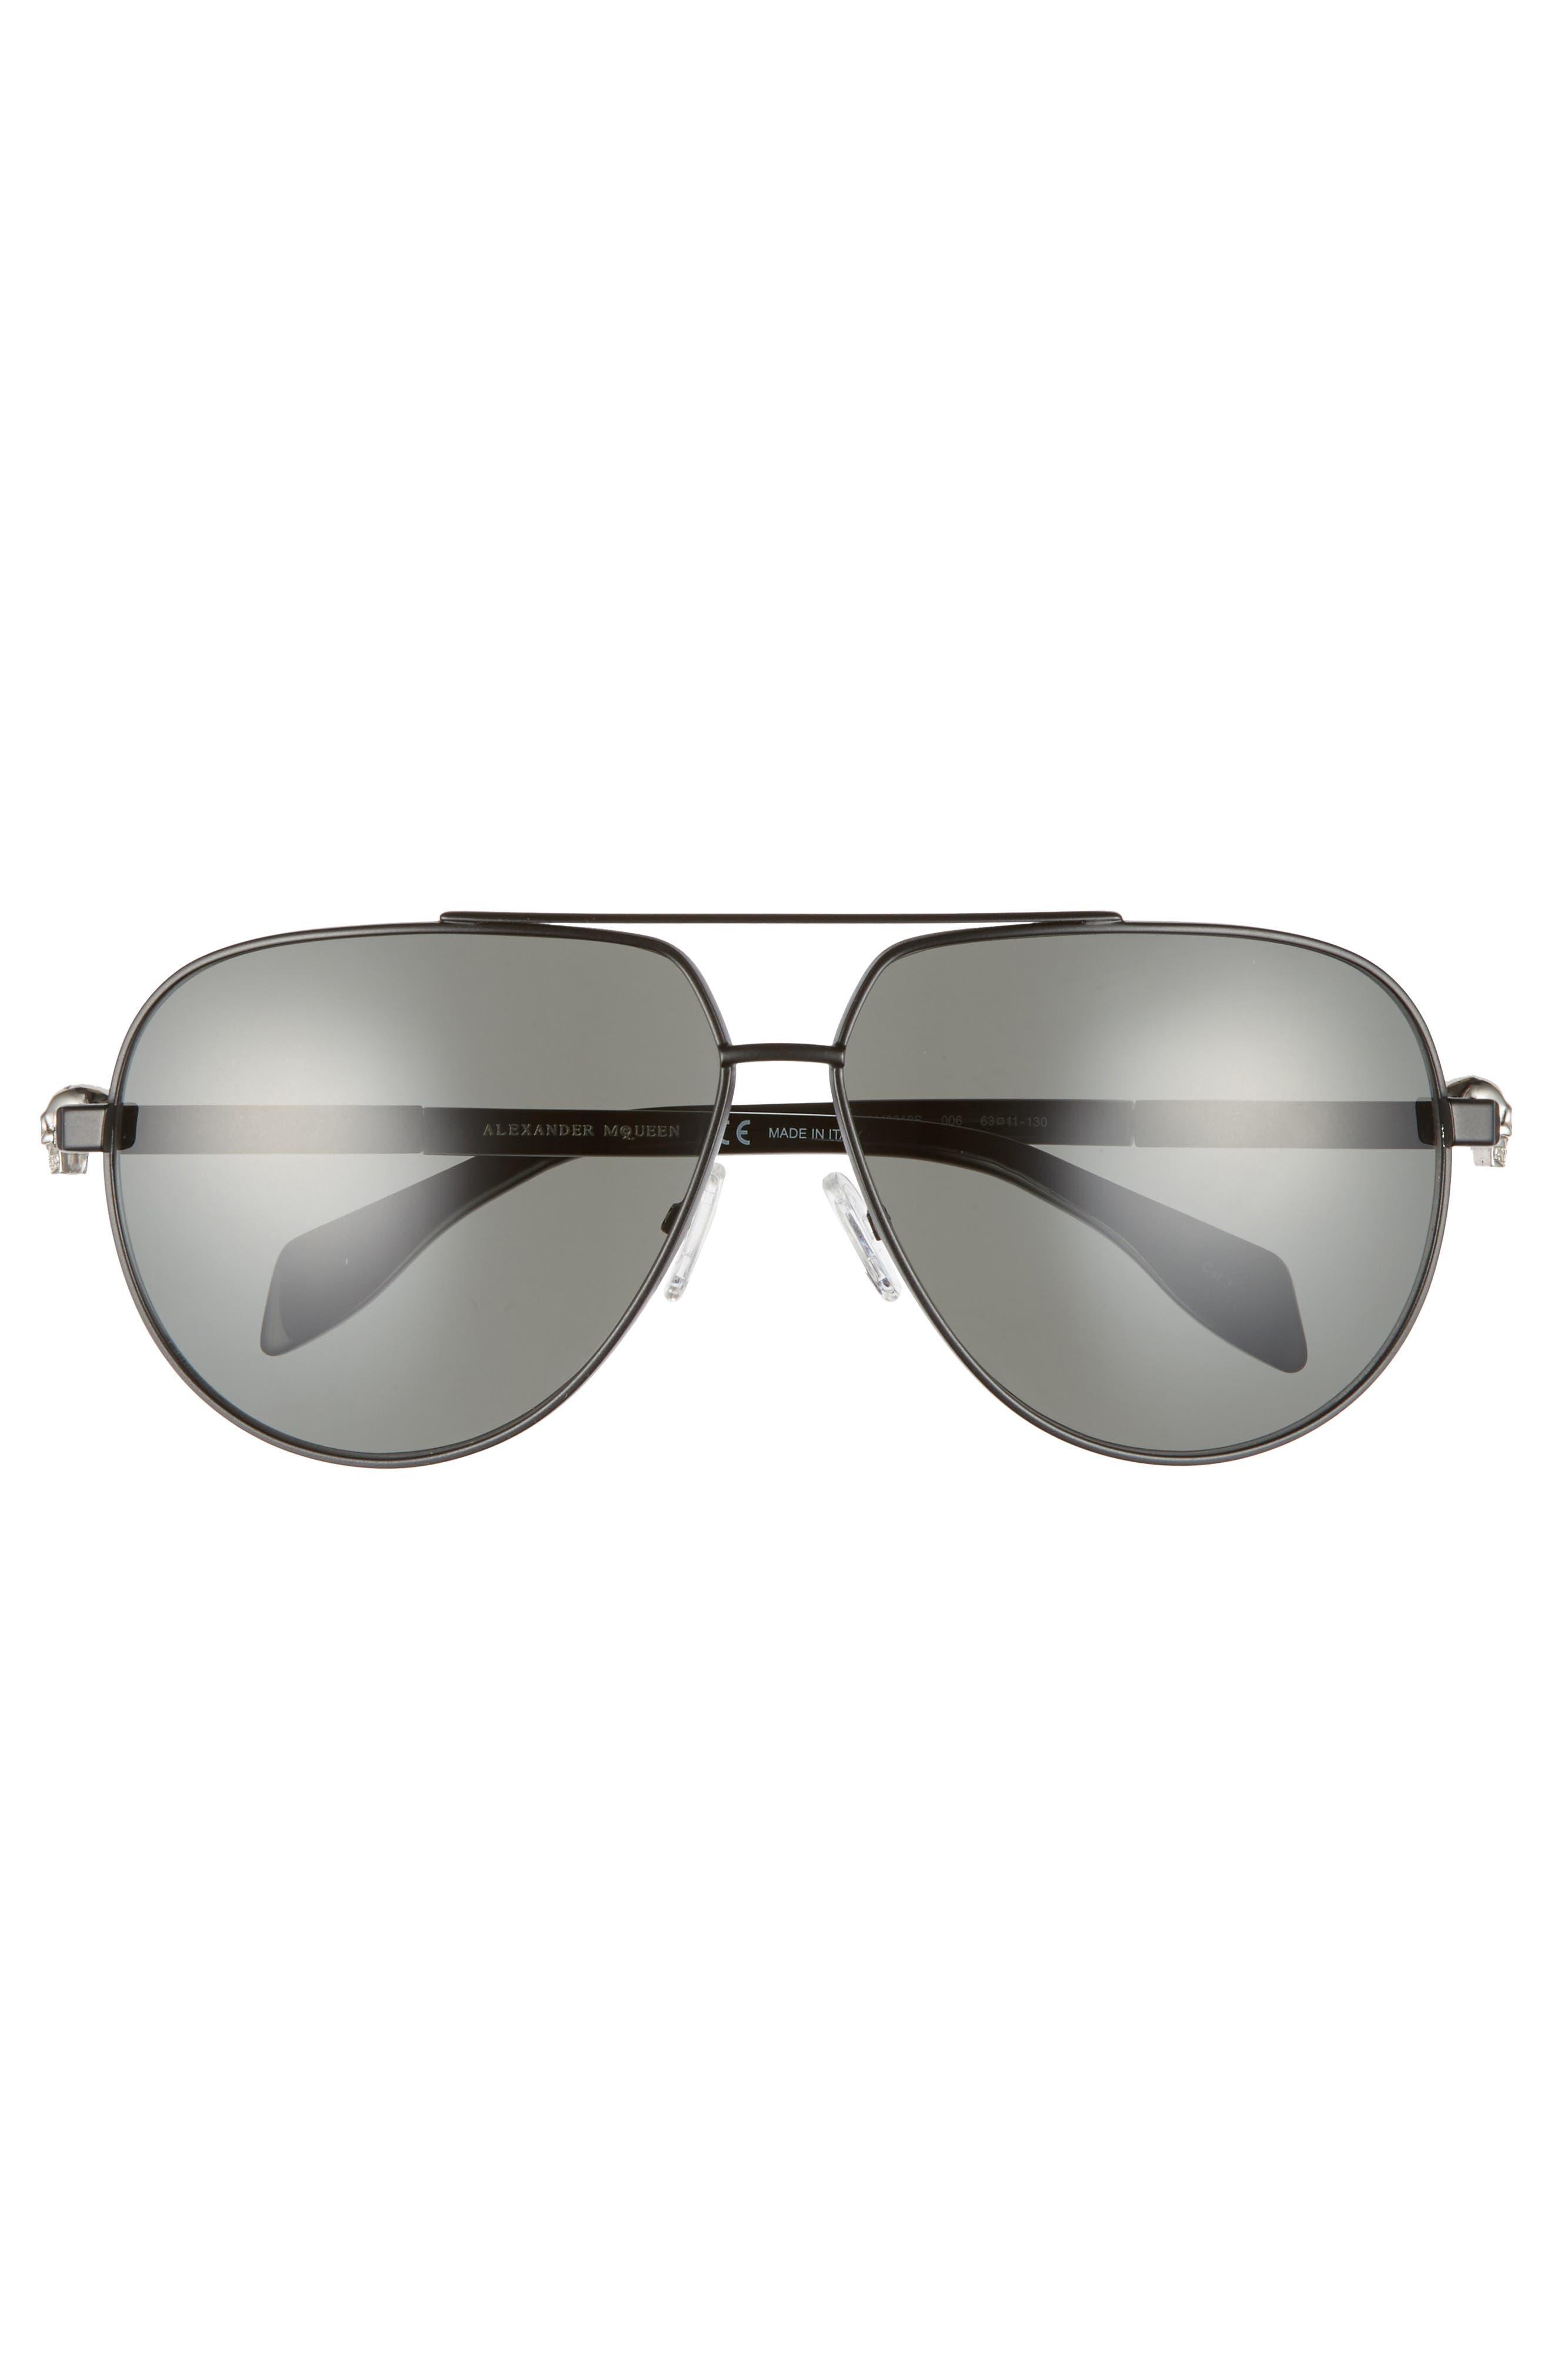 63mm Aviator Sunglasses,                             Alternate thumbnail 3, color,                             001